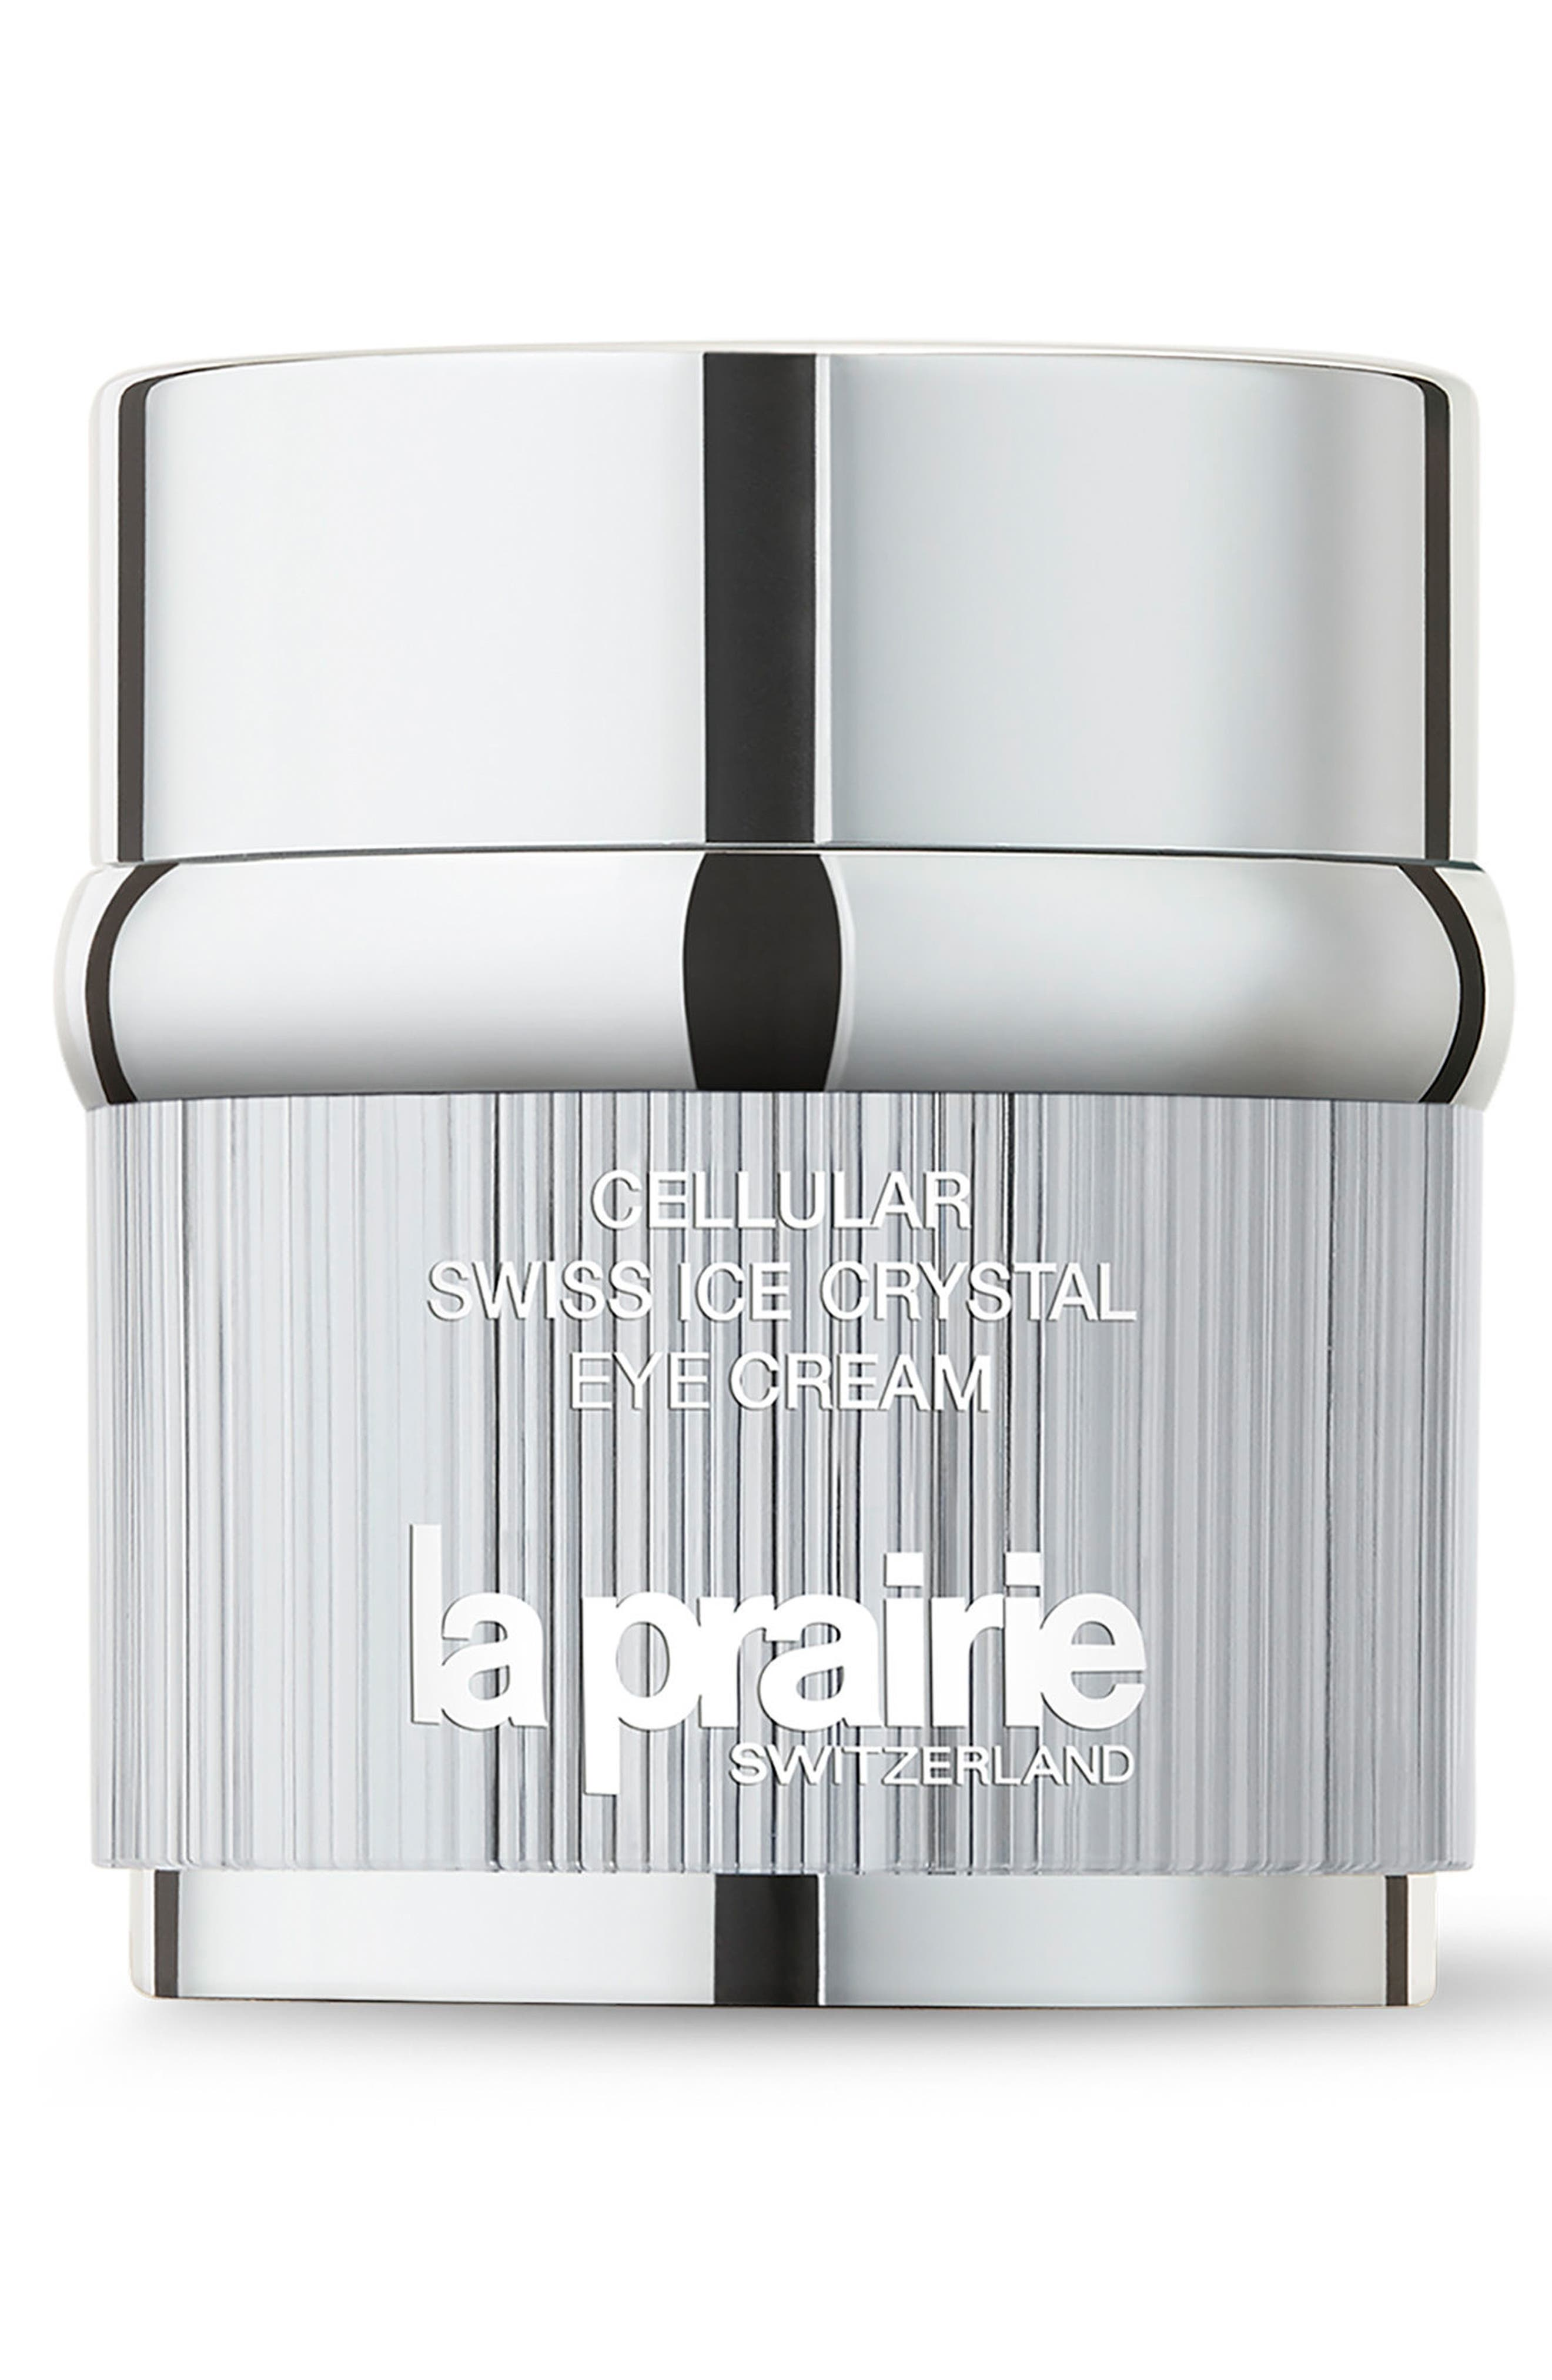 Main Image - La Prairie Cellular Swiss Ice Crystal Eye Cream